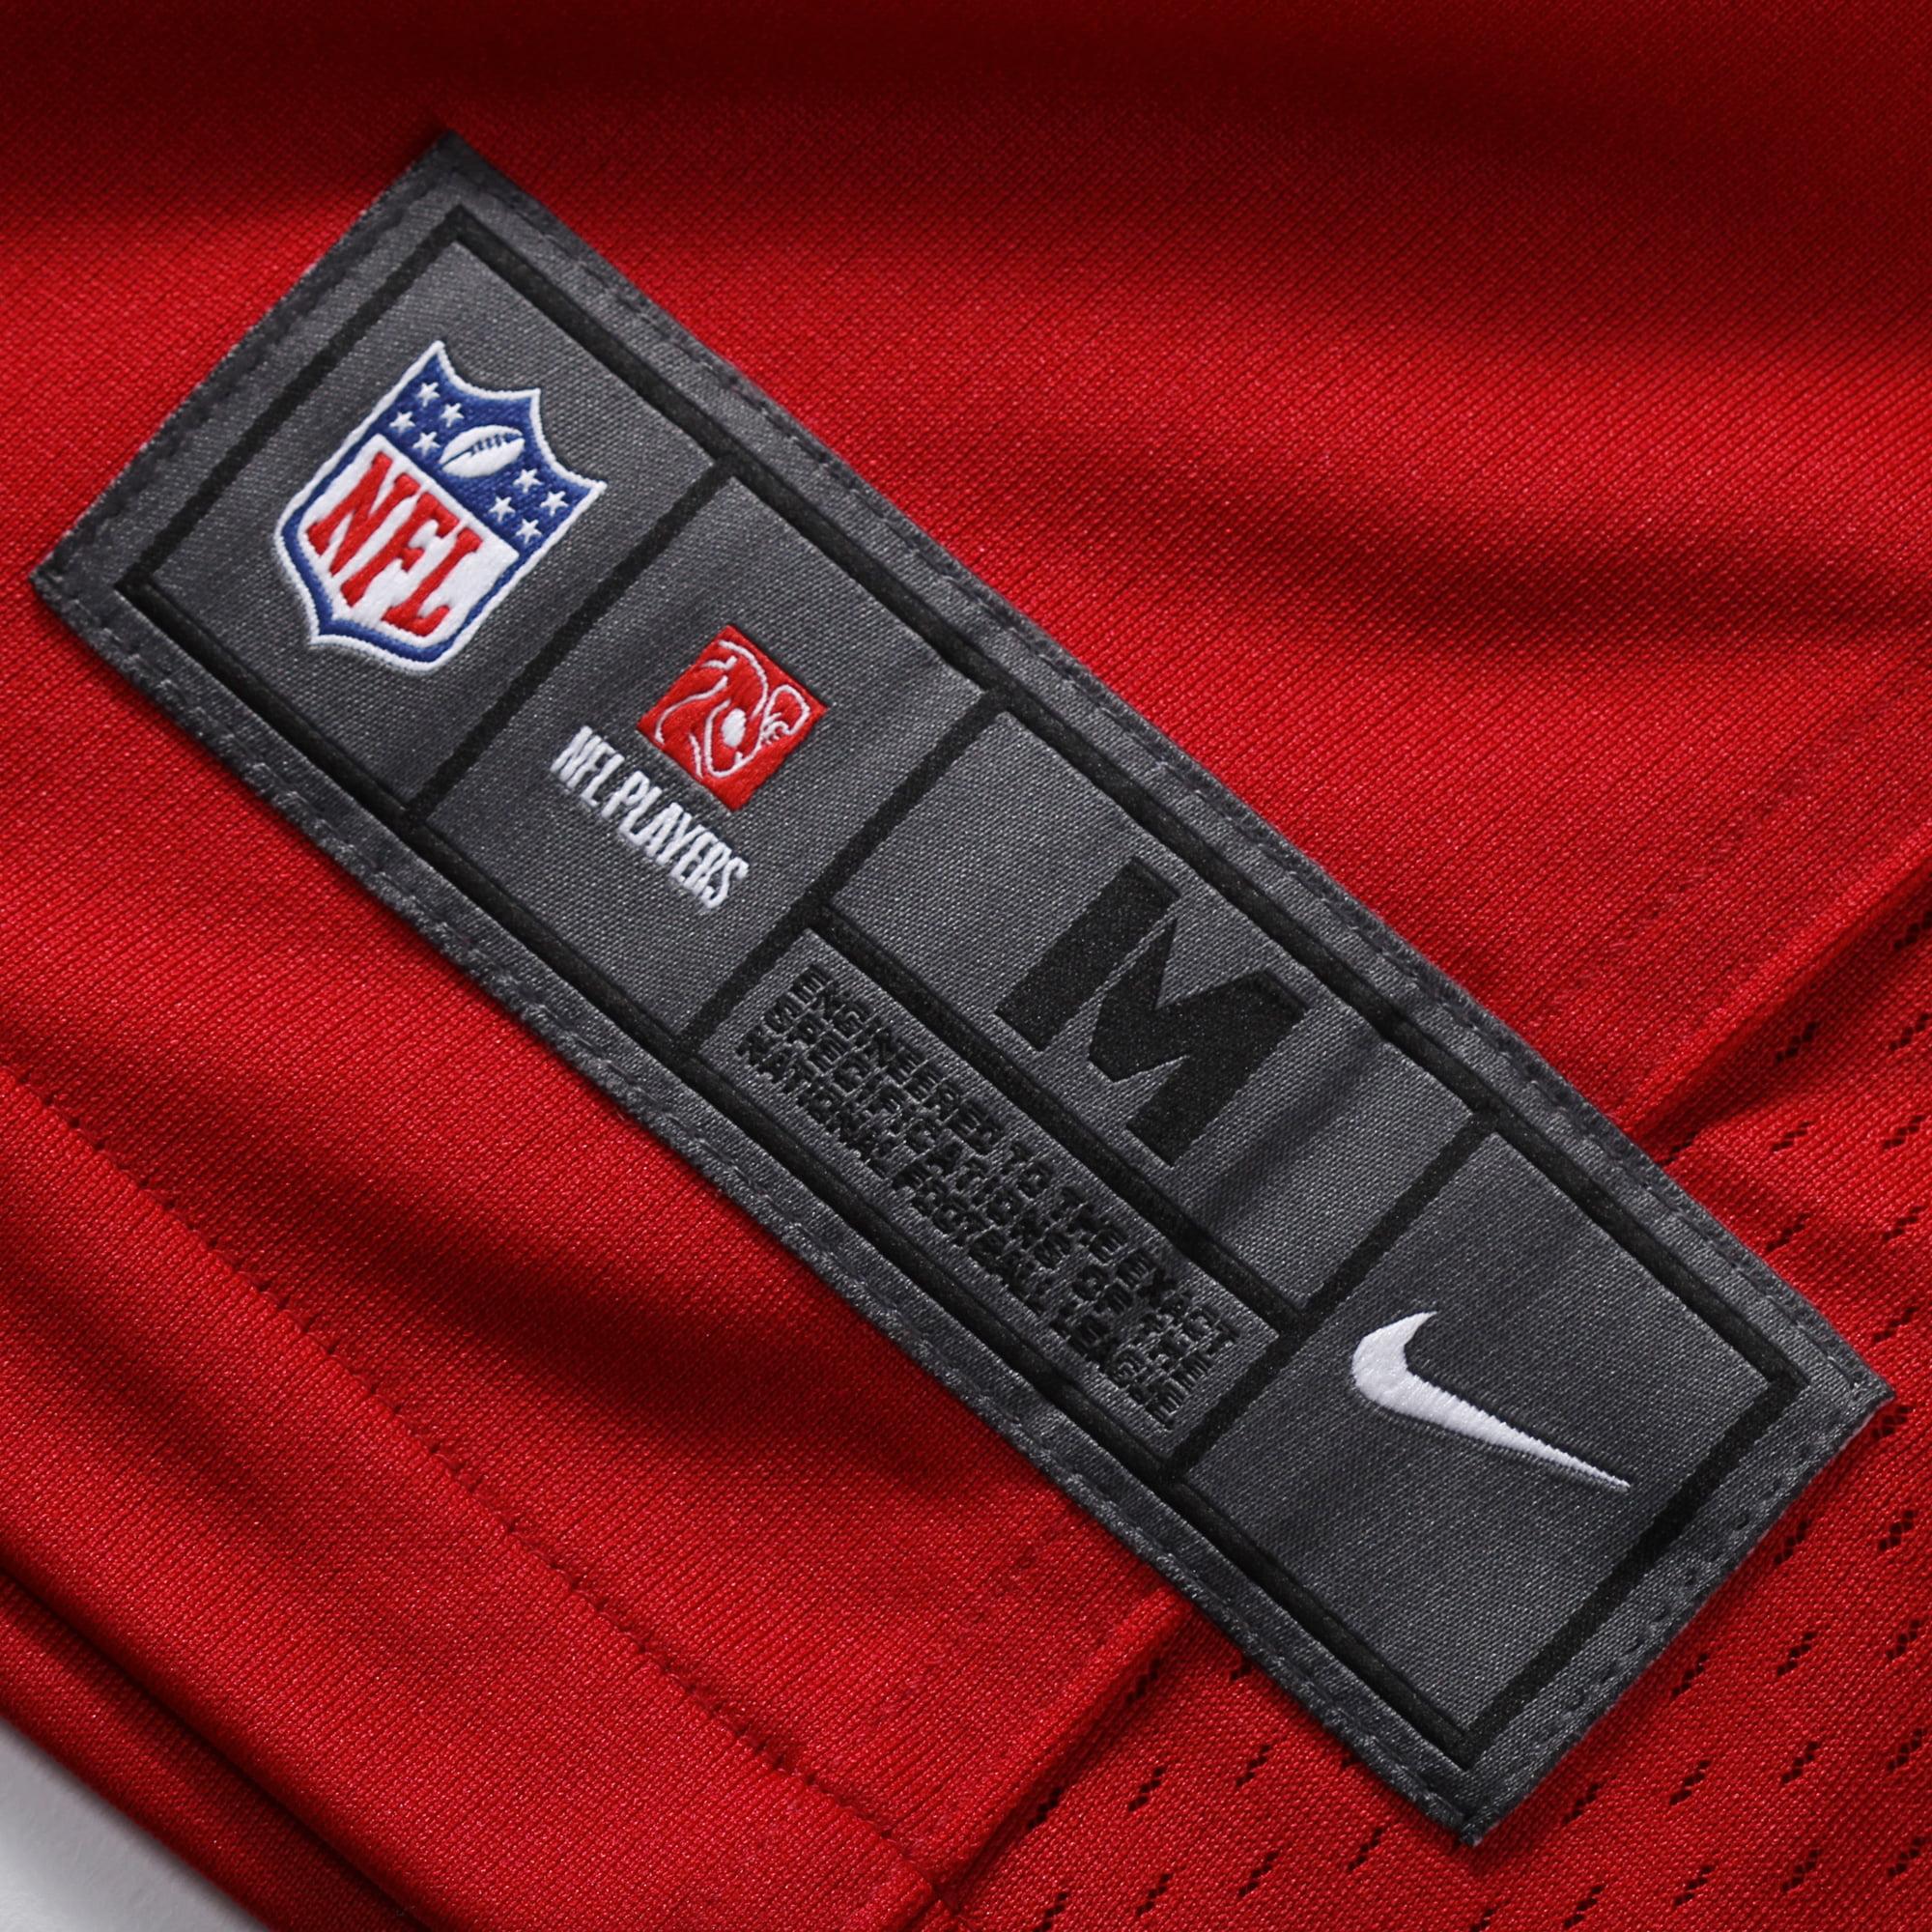 8364972cb Nick Bosa San Francisco 49ers Nike 2019 NFL Draft First Round Pick Game  Jersey - Scarlet - Walmart.com